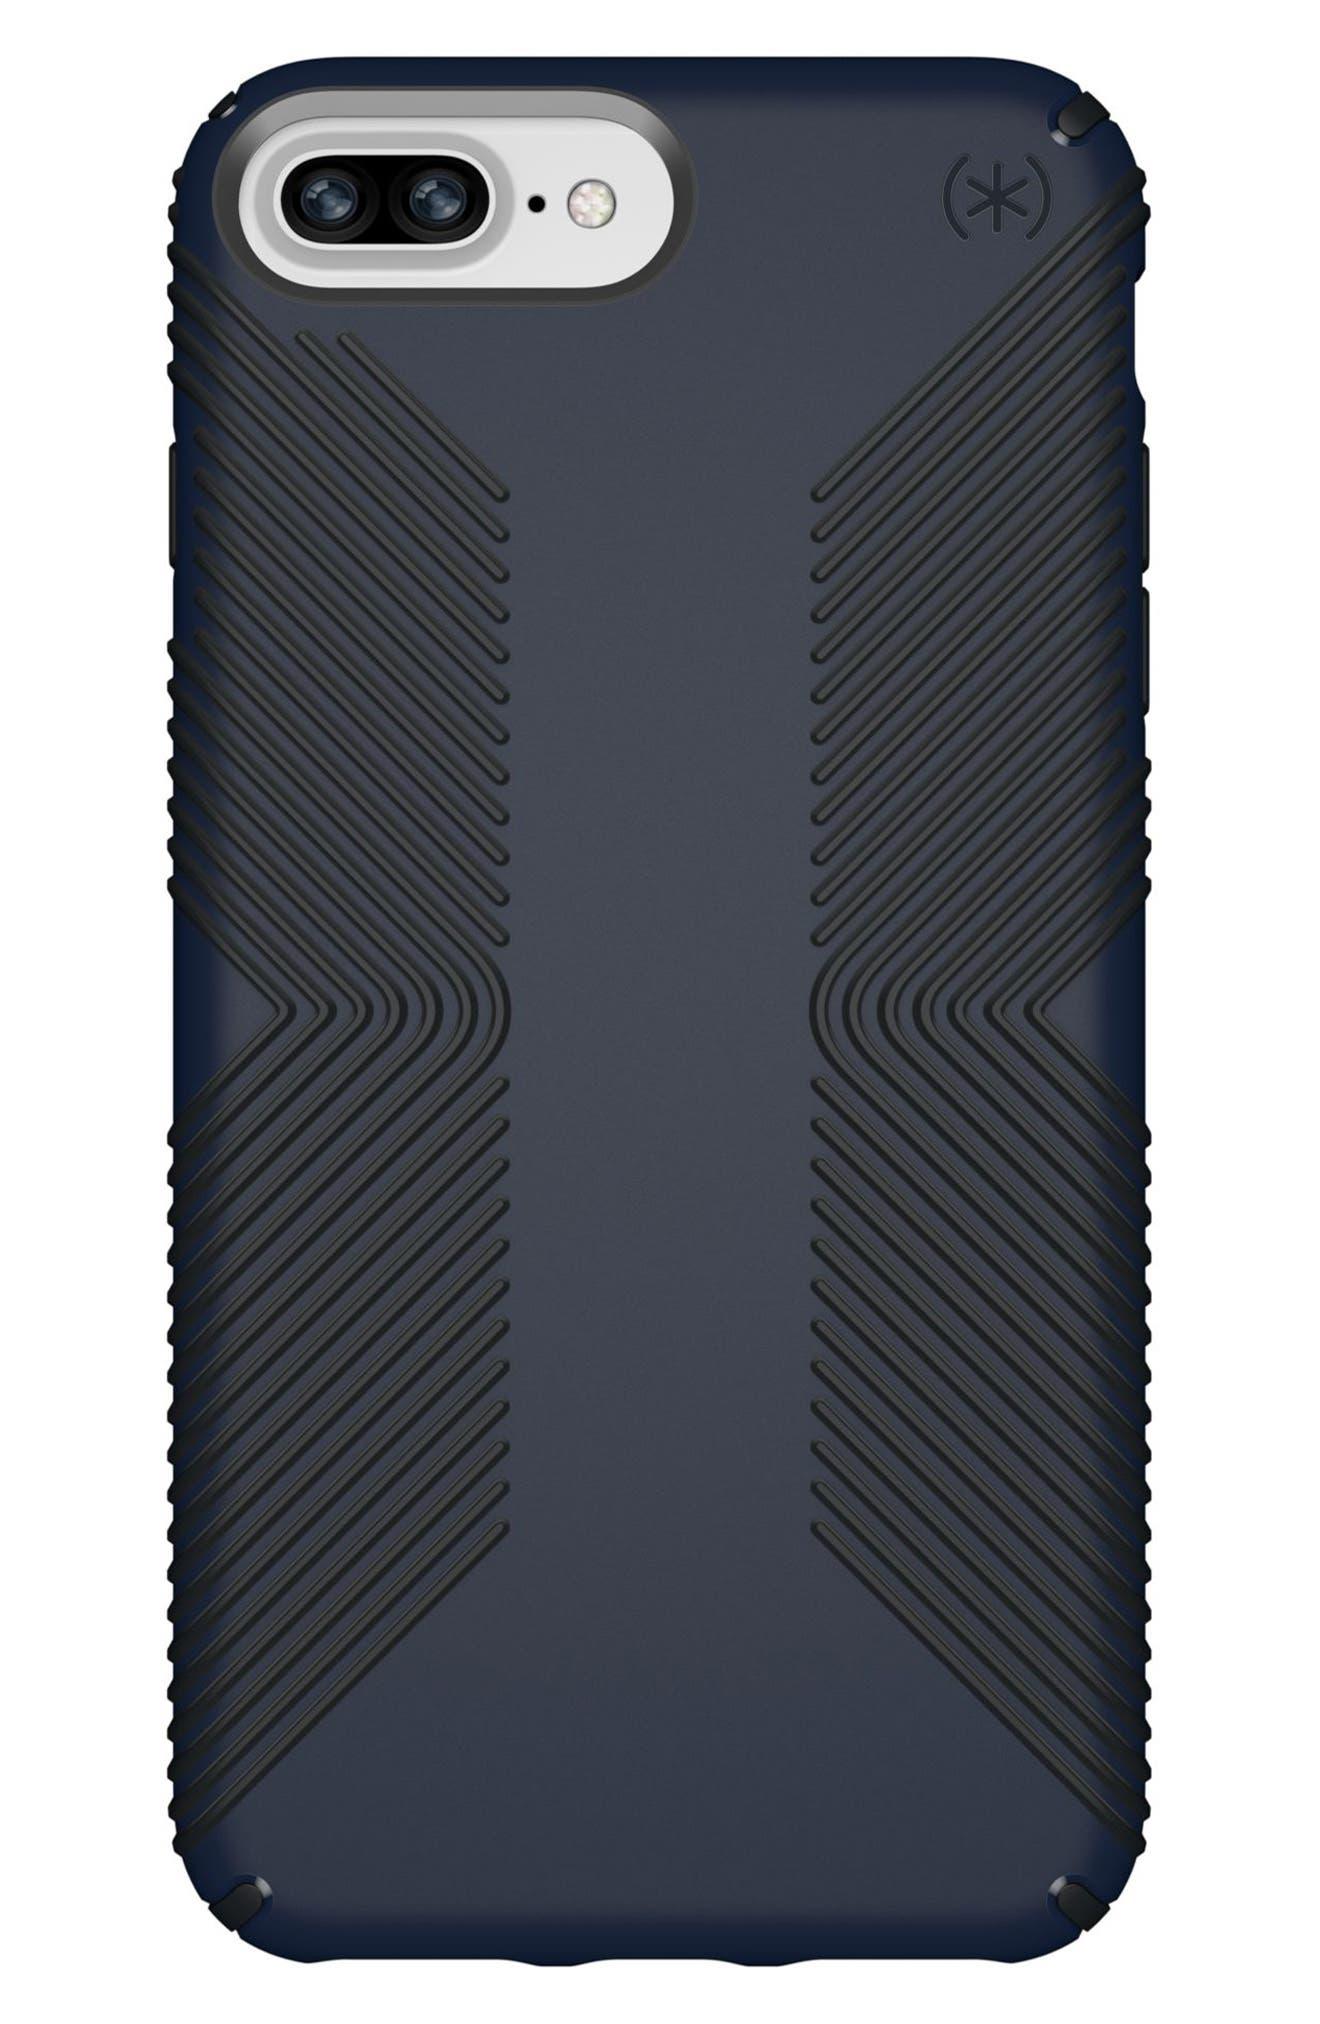 Main Image - Speck Grip iPhone 6/6s/7/8 Plus Case